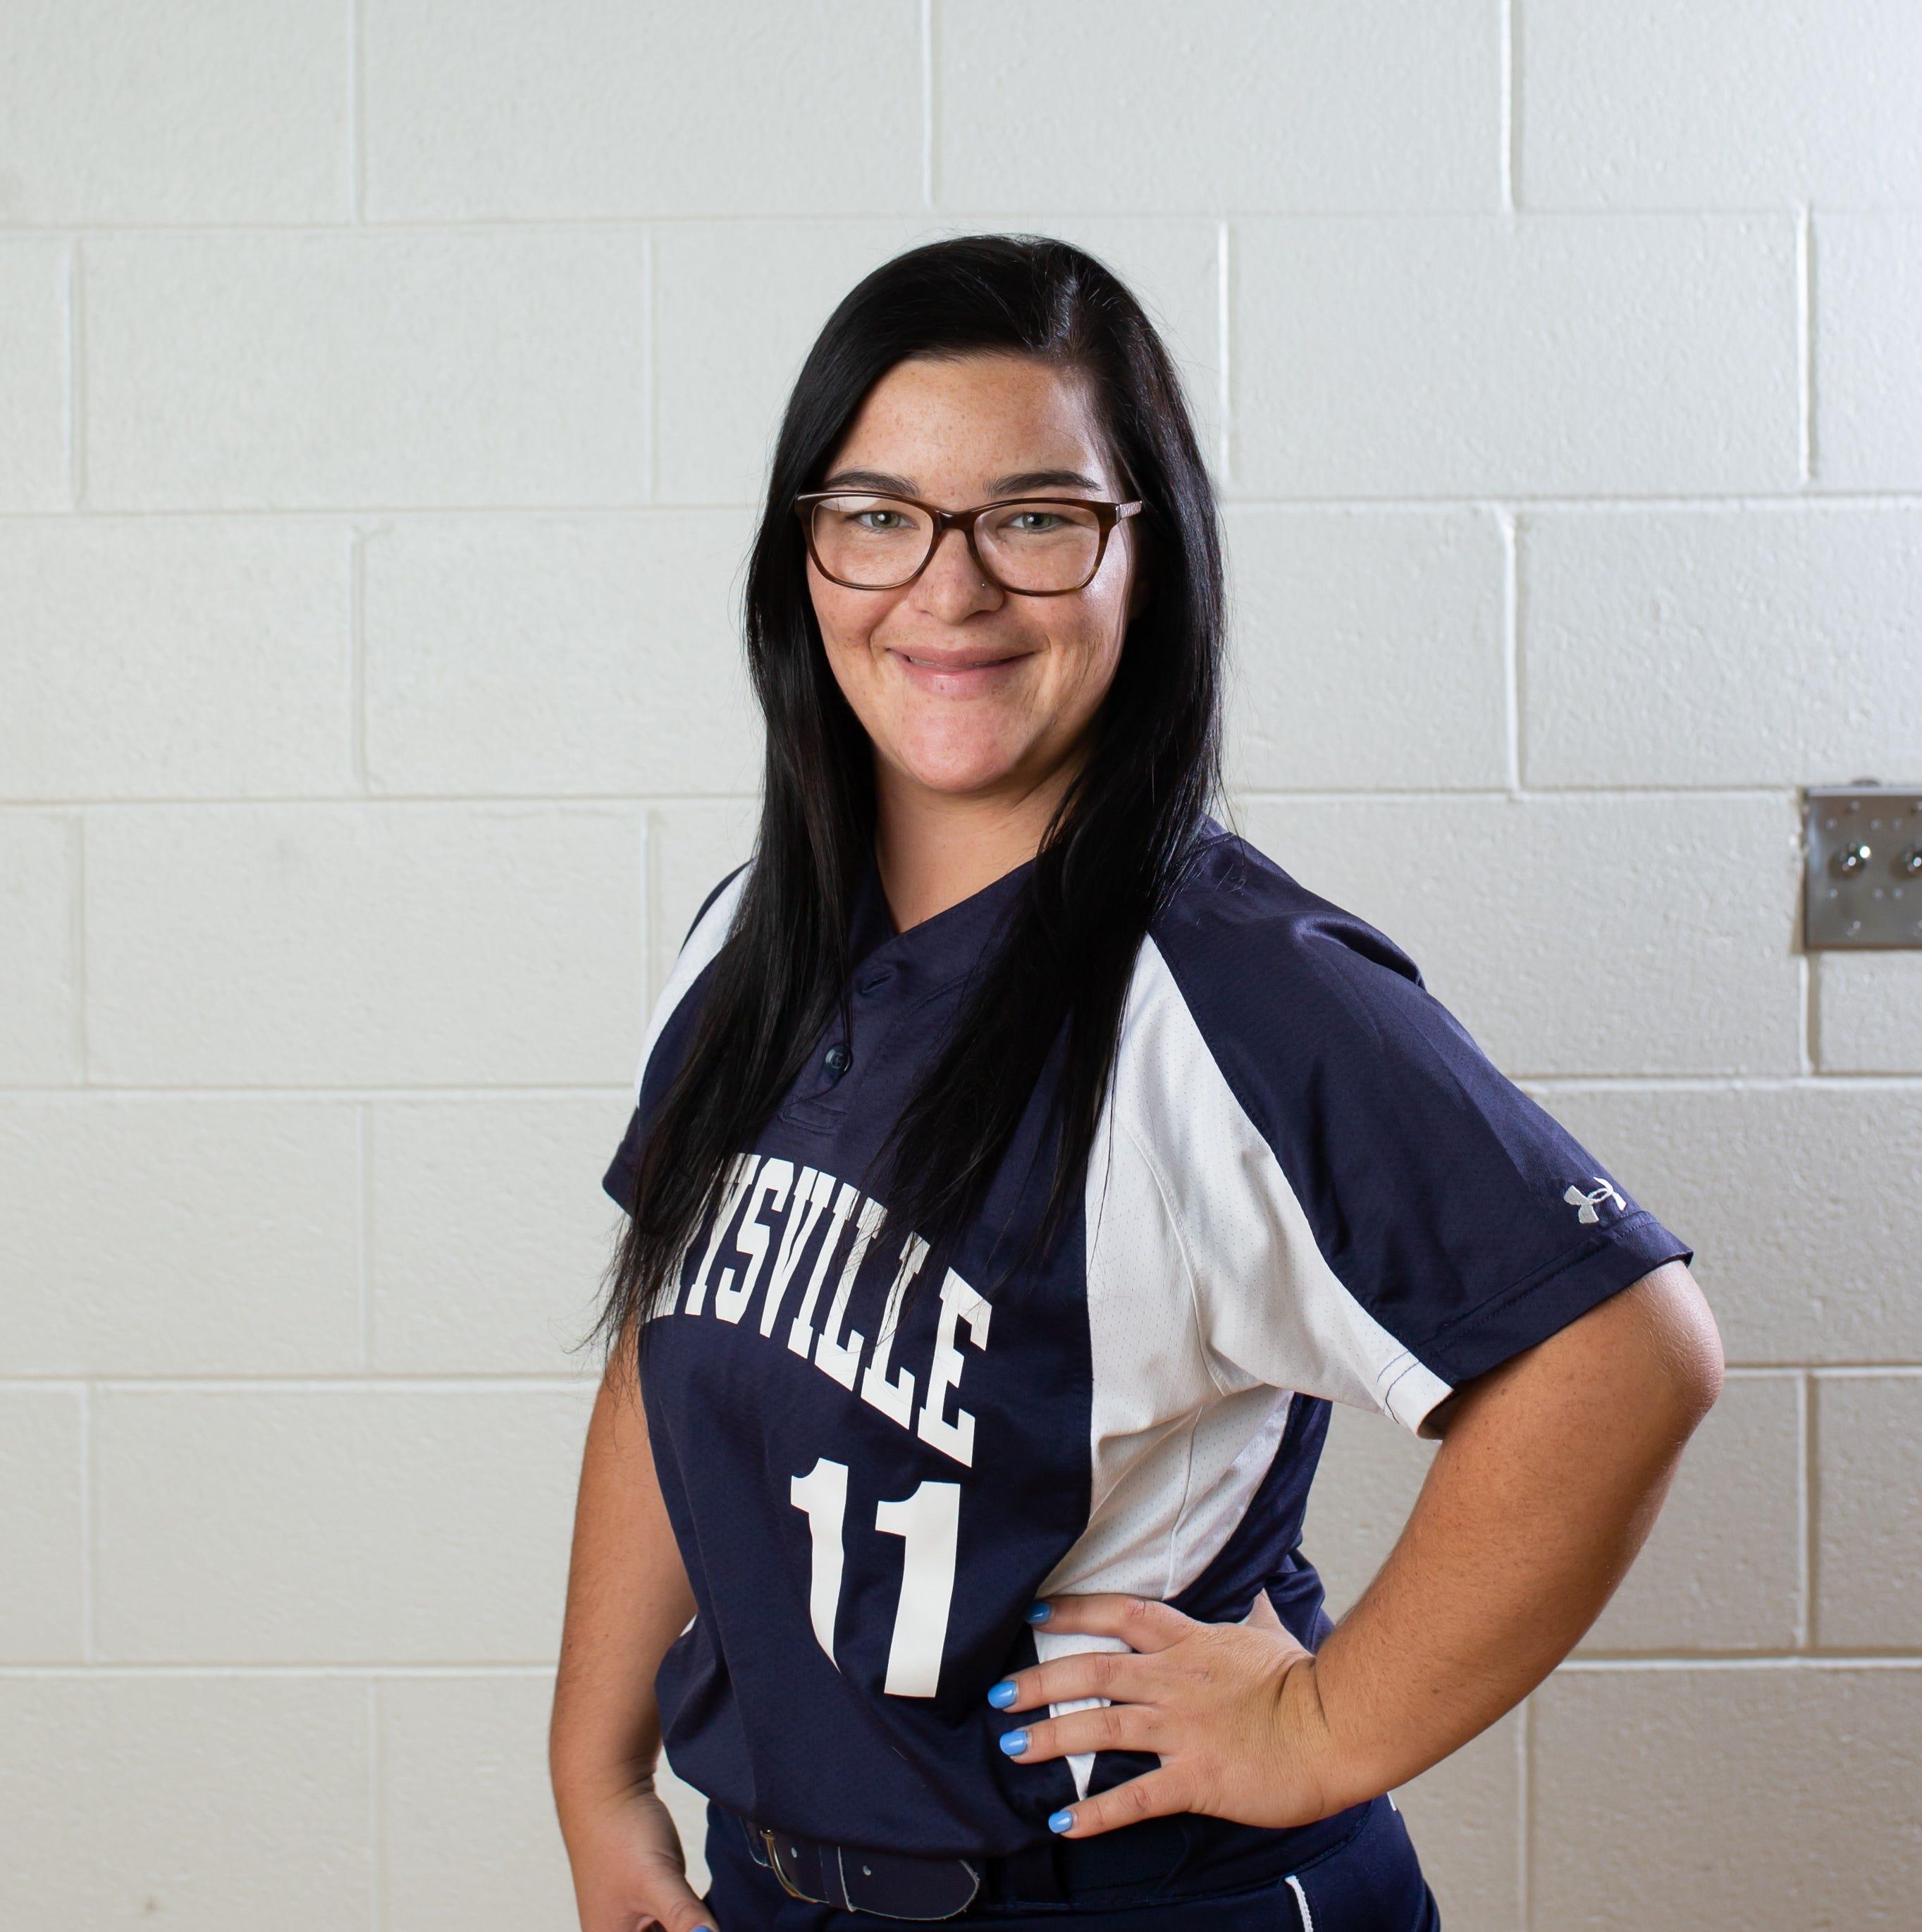 Athlete of the Week: Kruskie enjoys big week for Marysville softball